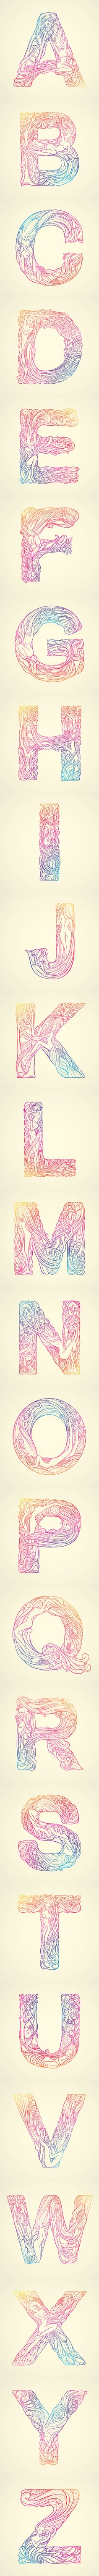 """whispered garden alphabets una tipografia inspirada en la belleza de la mujer y la naturaleza'' THUY MAT TIT"